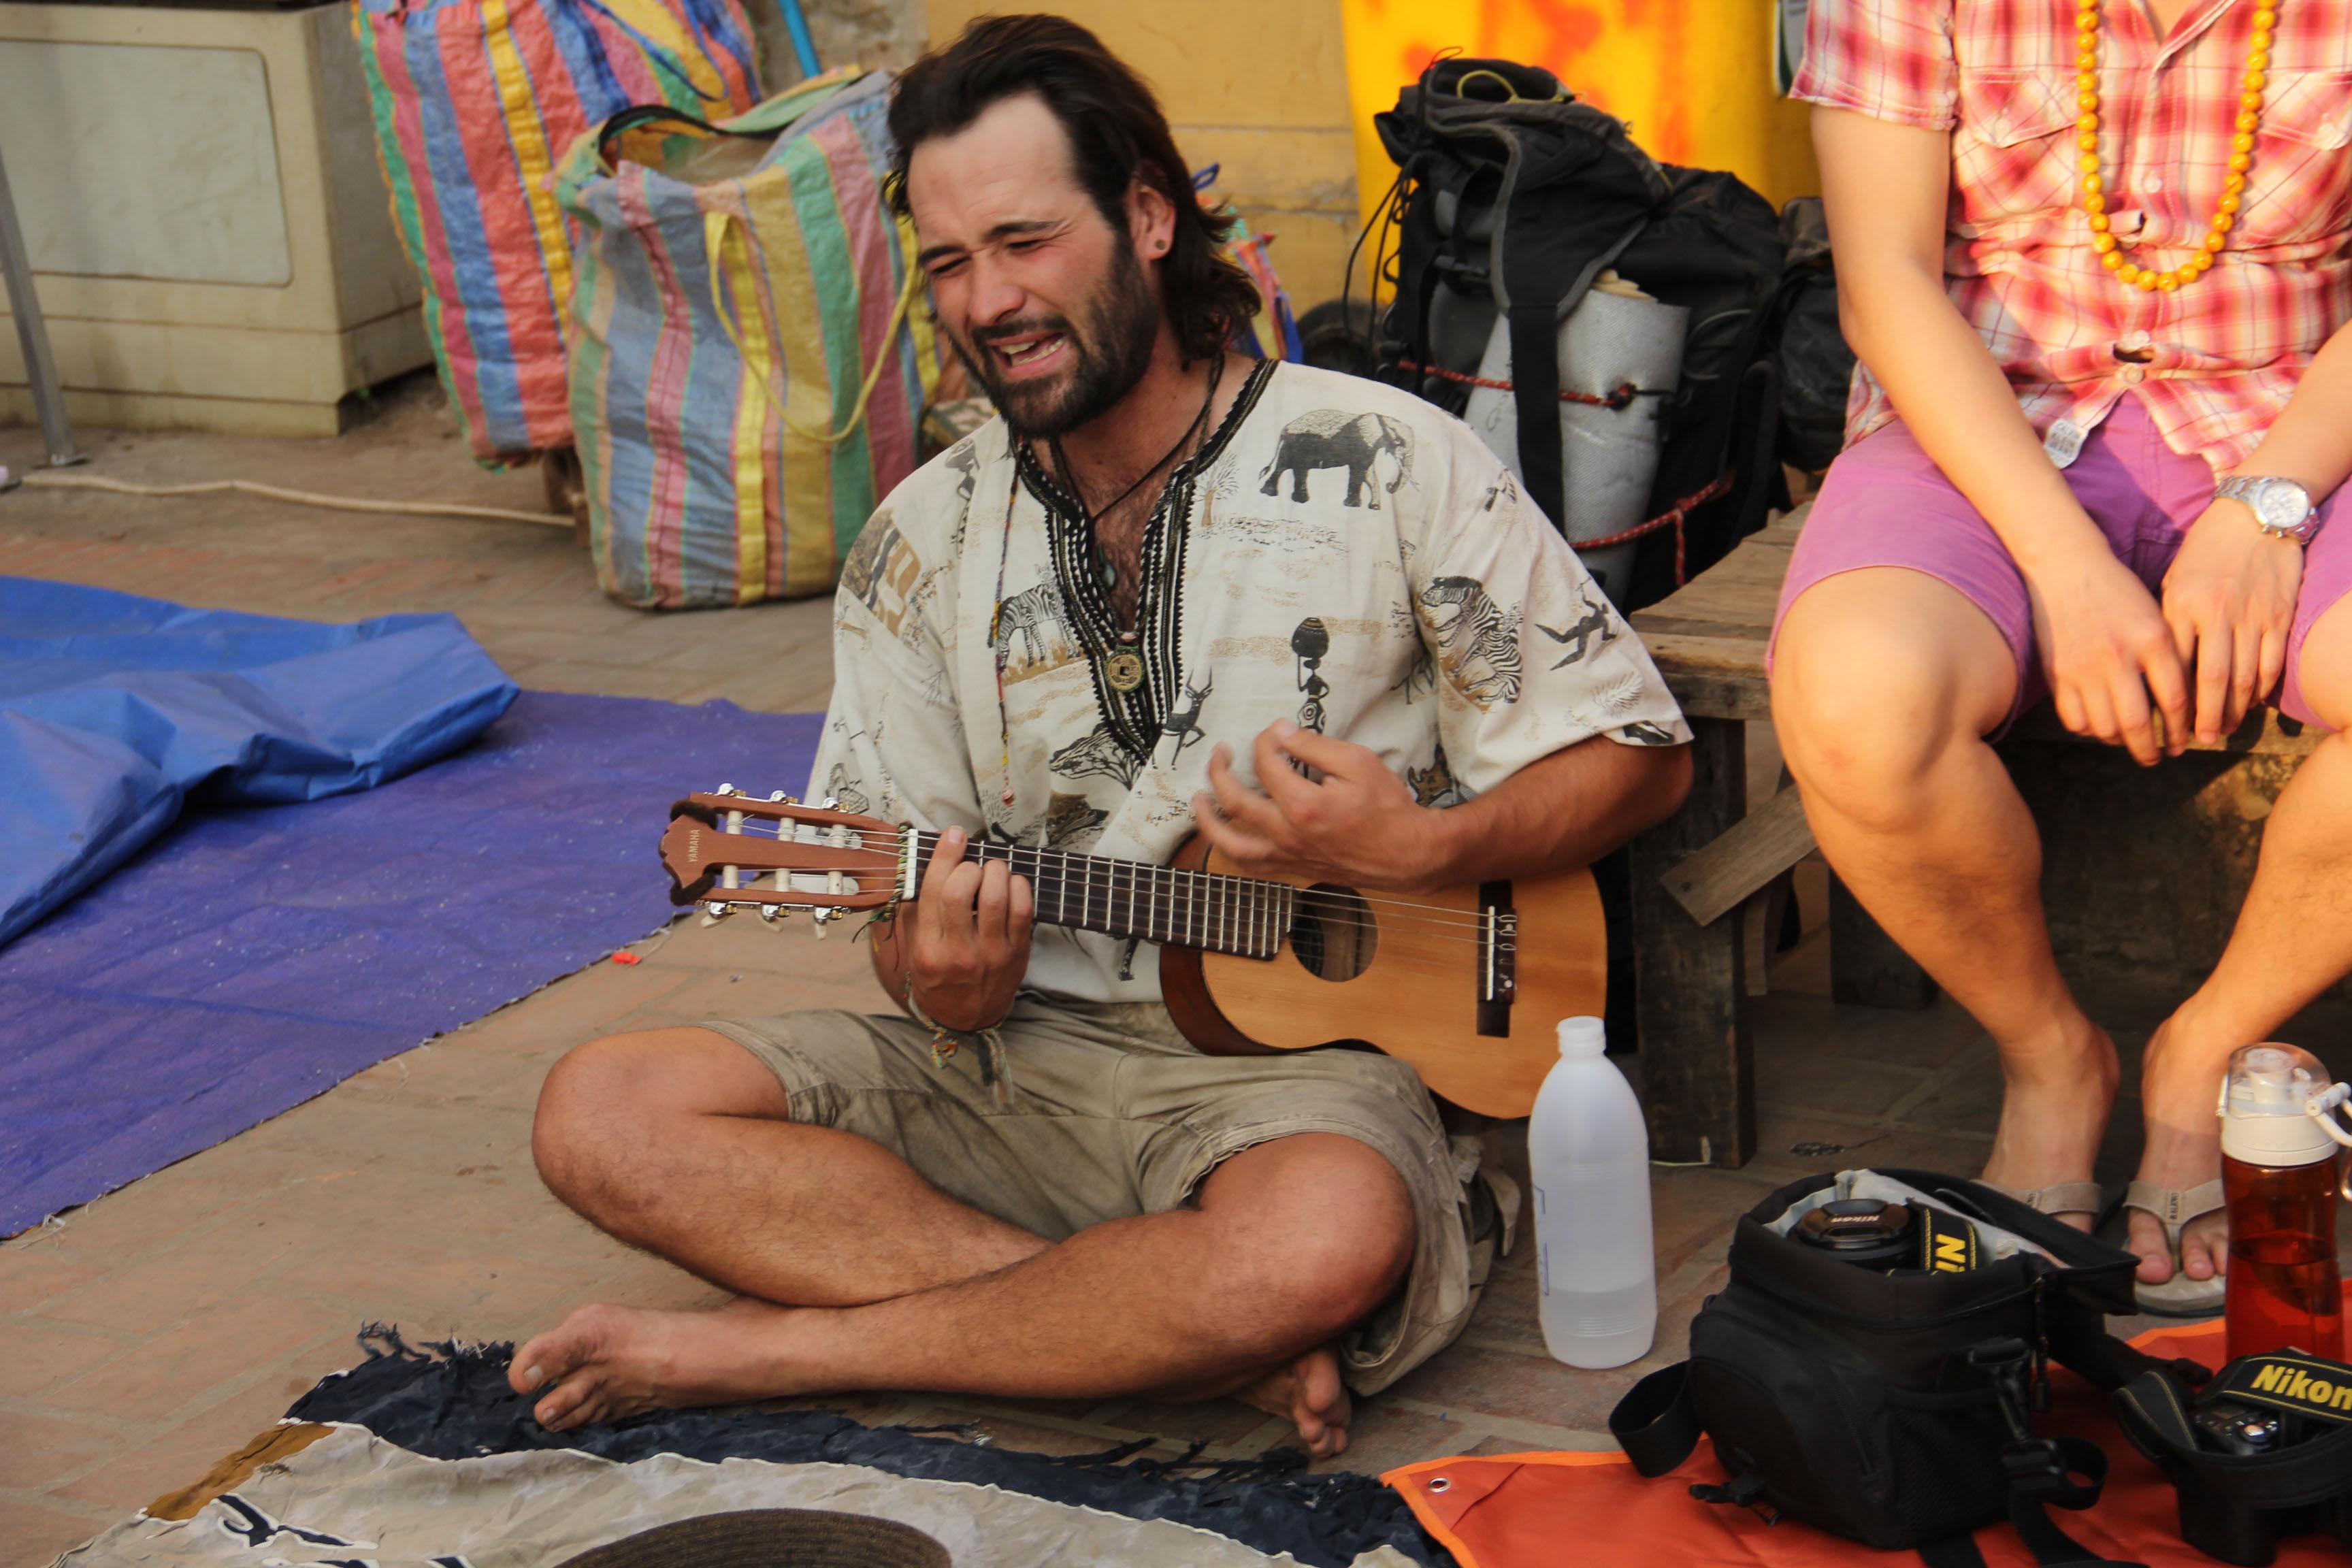 western guy on guitar